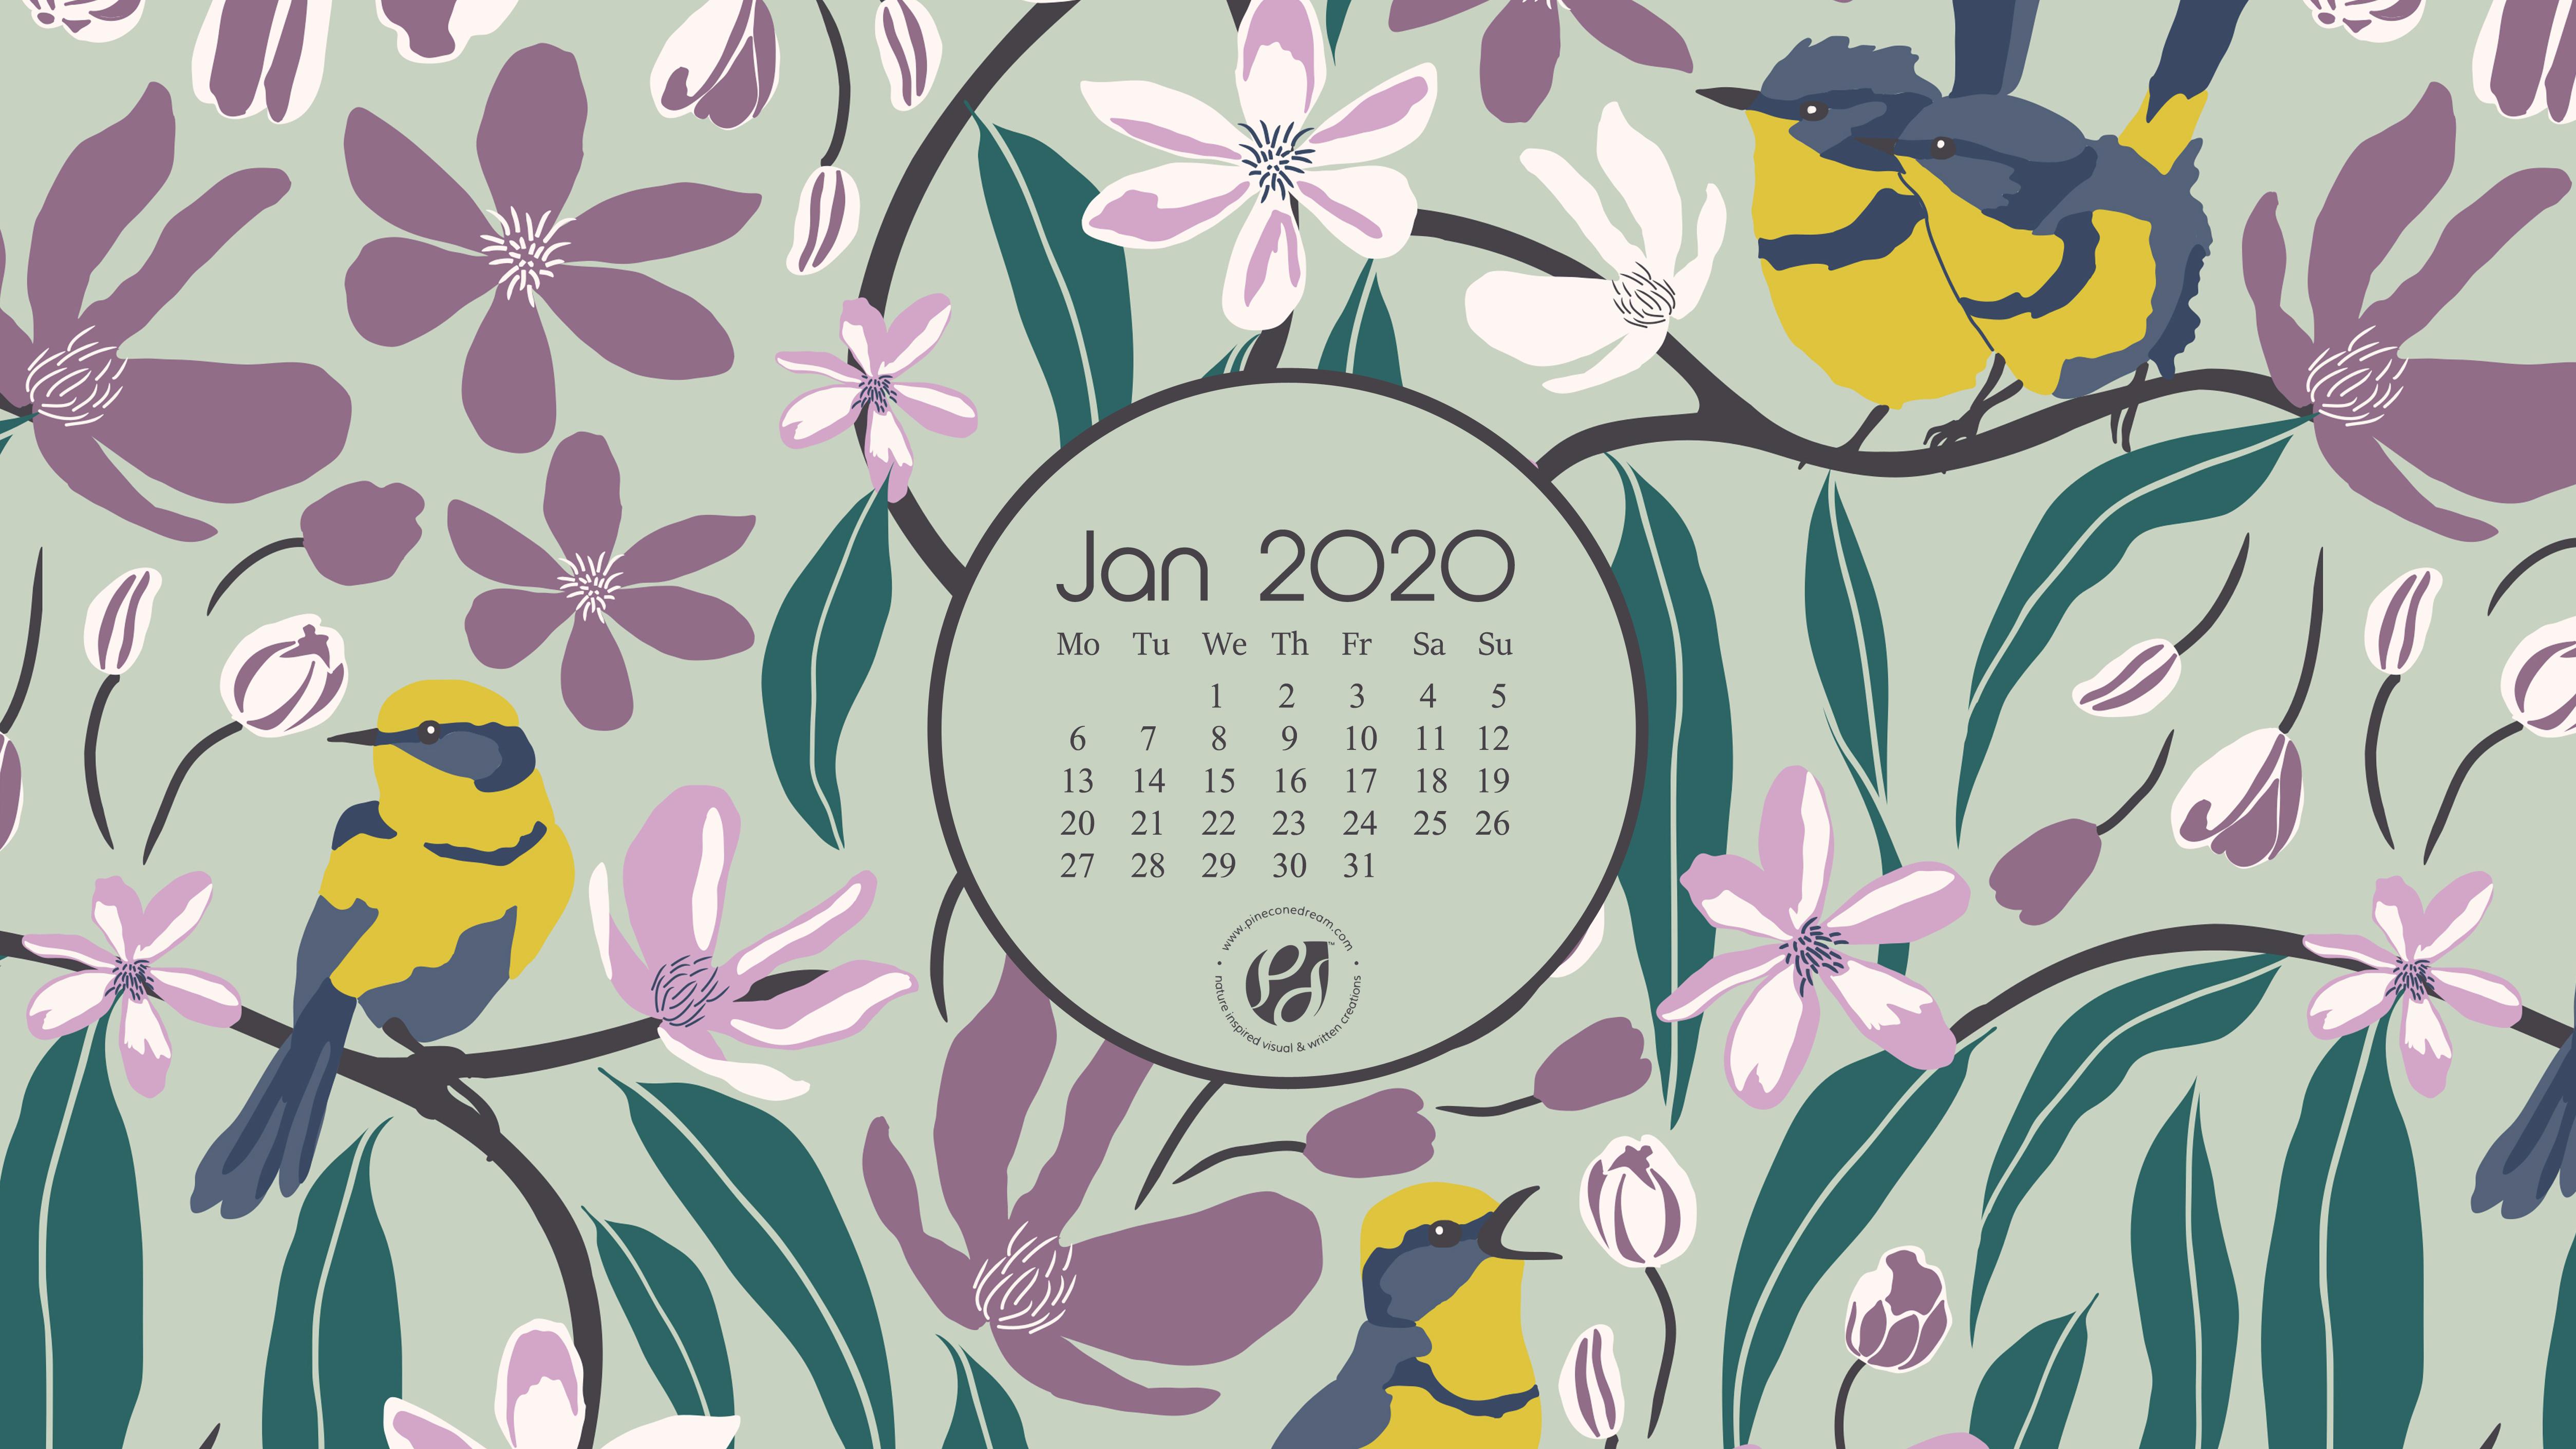 download Jan 2020 calendar wallpapers printable planner 5015x2821